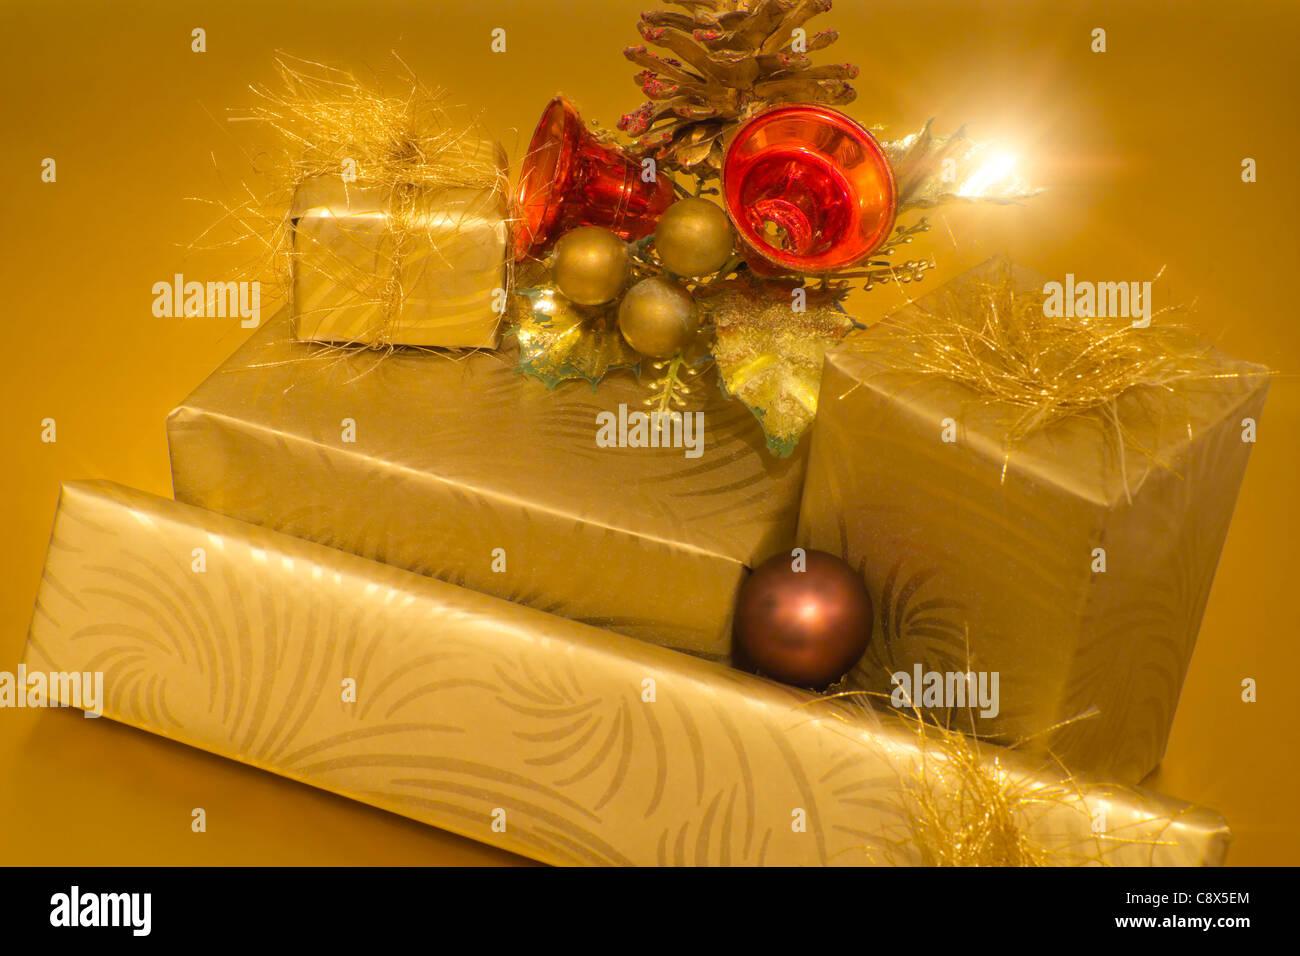 Christmas Gifts Stock Photo: 39913068 - Alamy